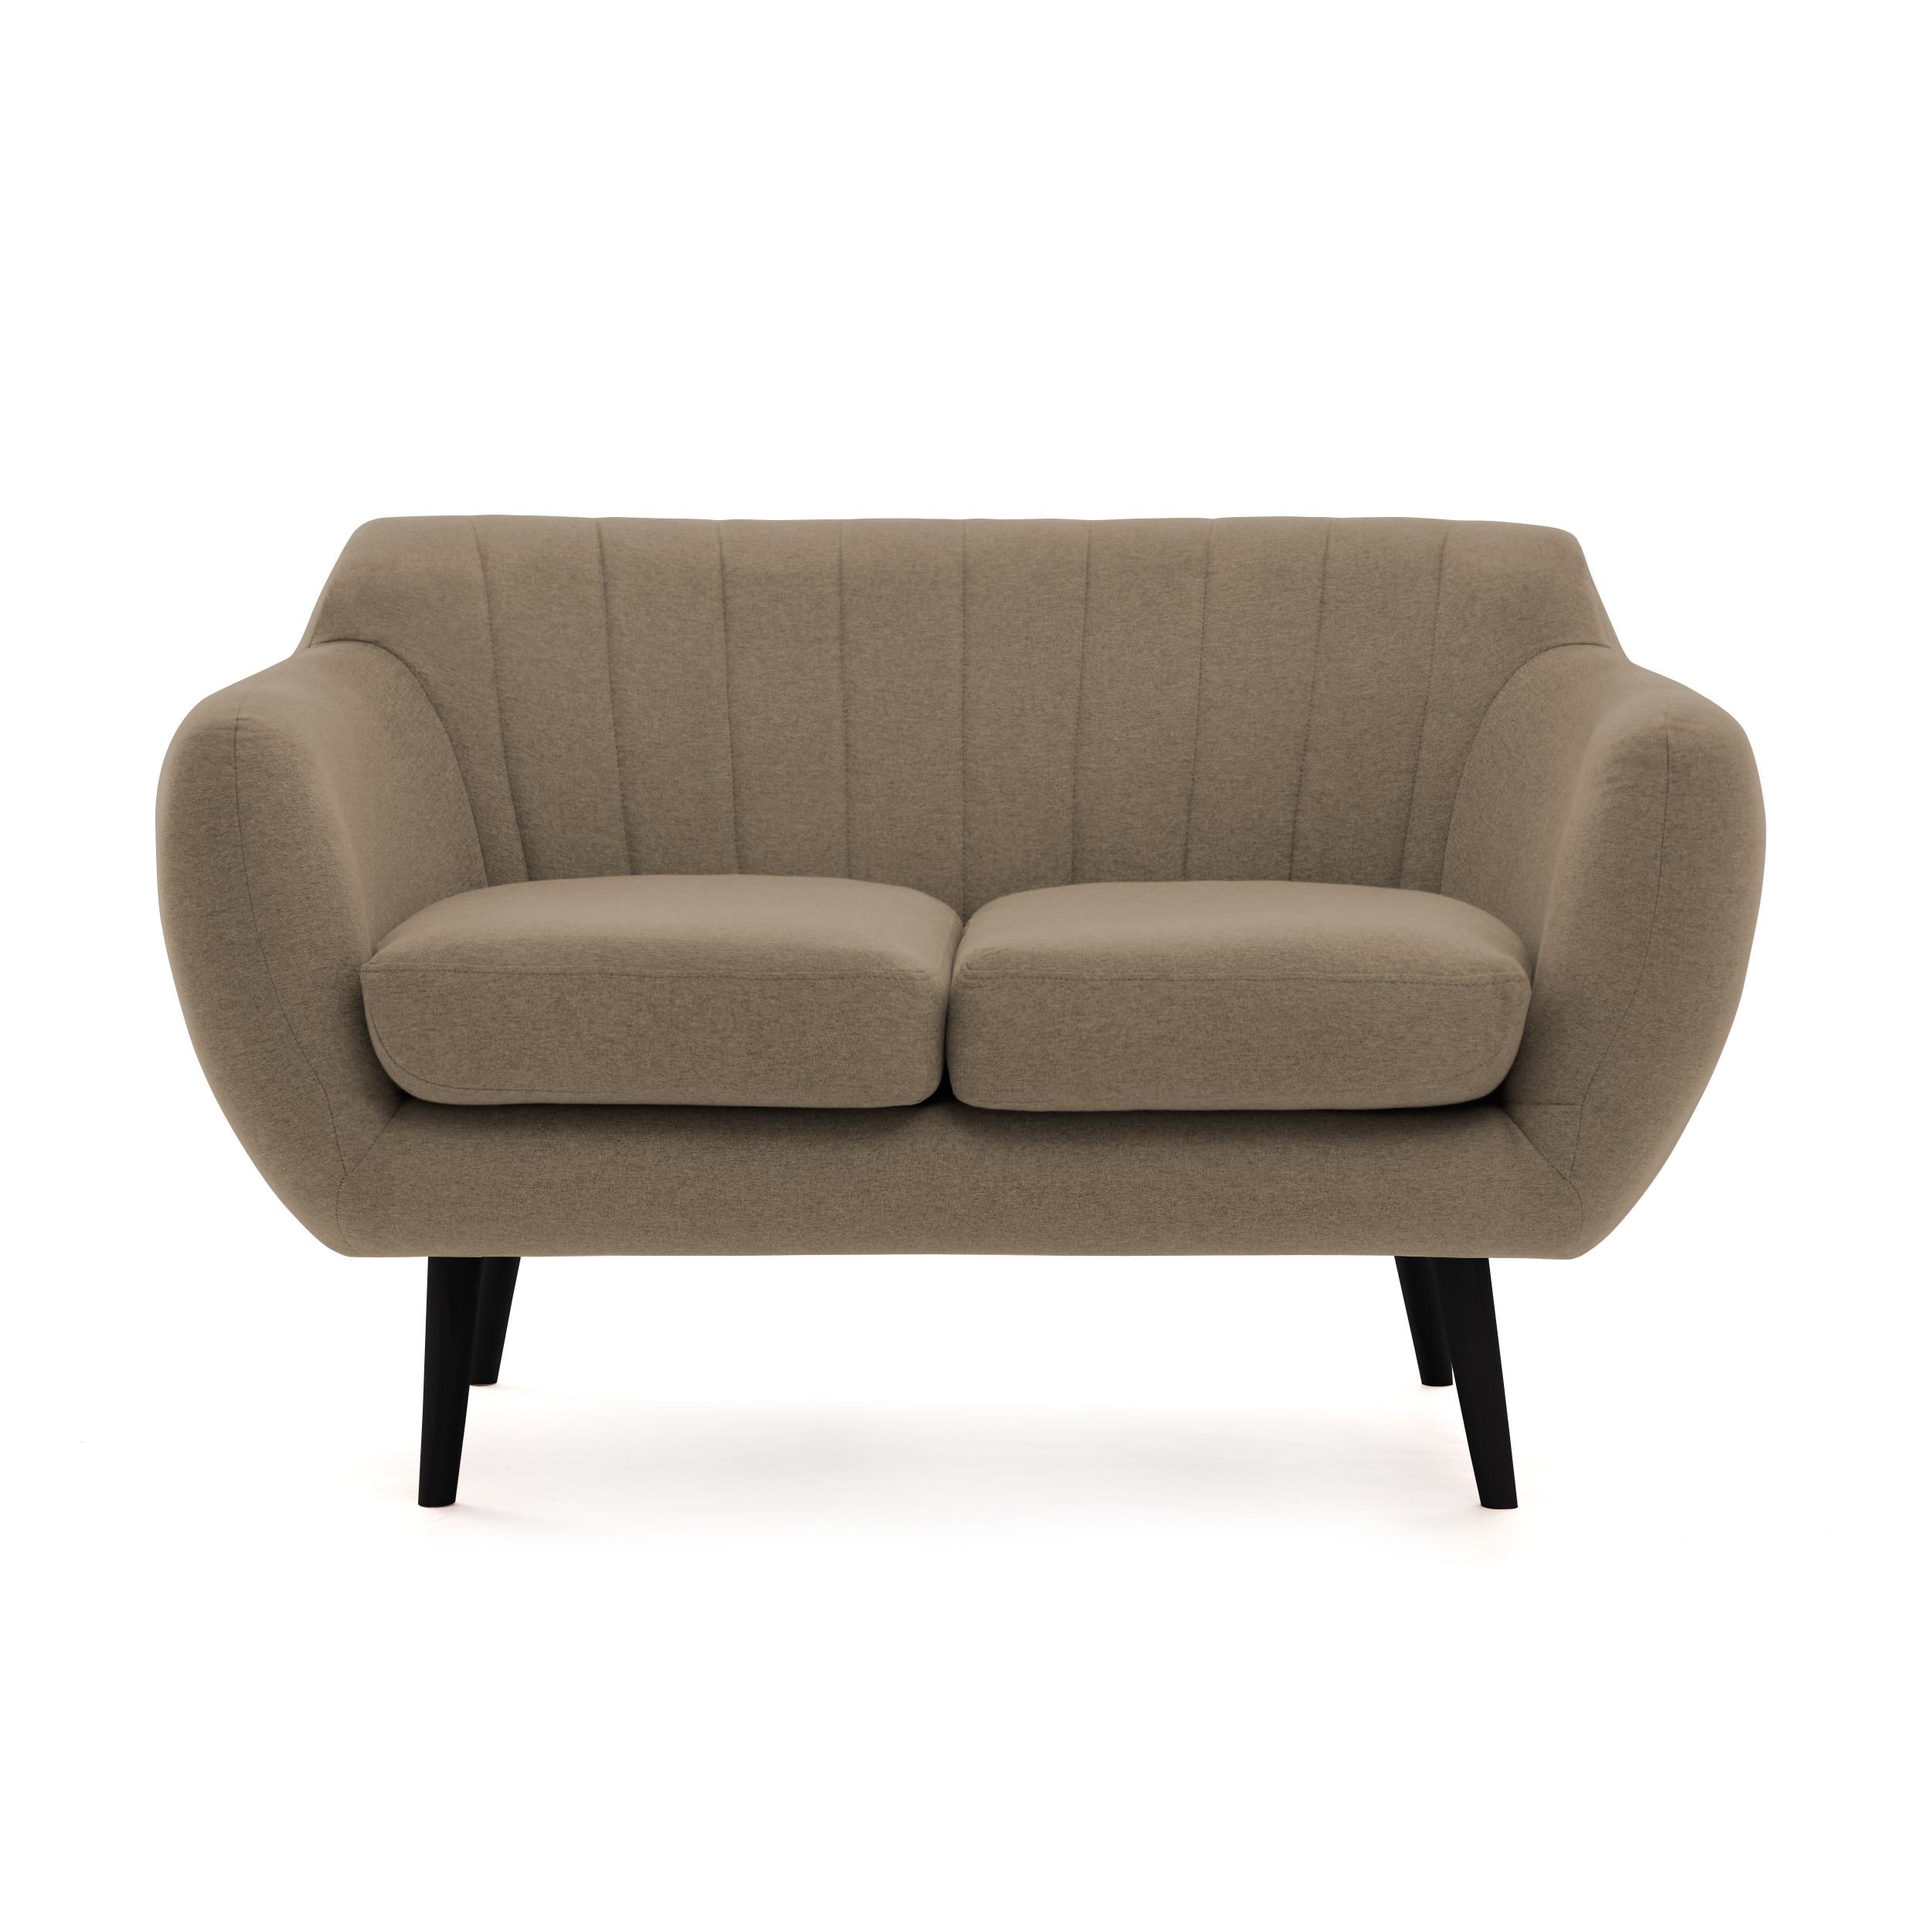 Canapea Fixa 2 locuri Kennet Beige II